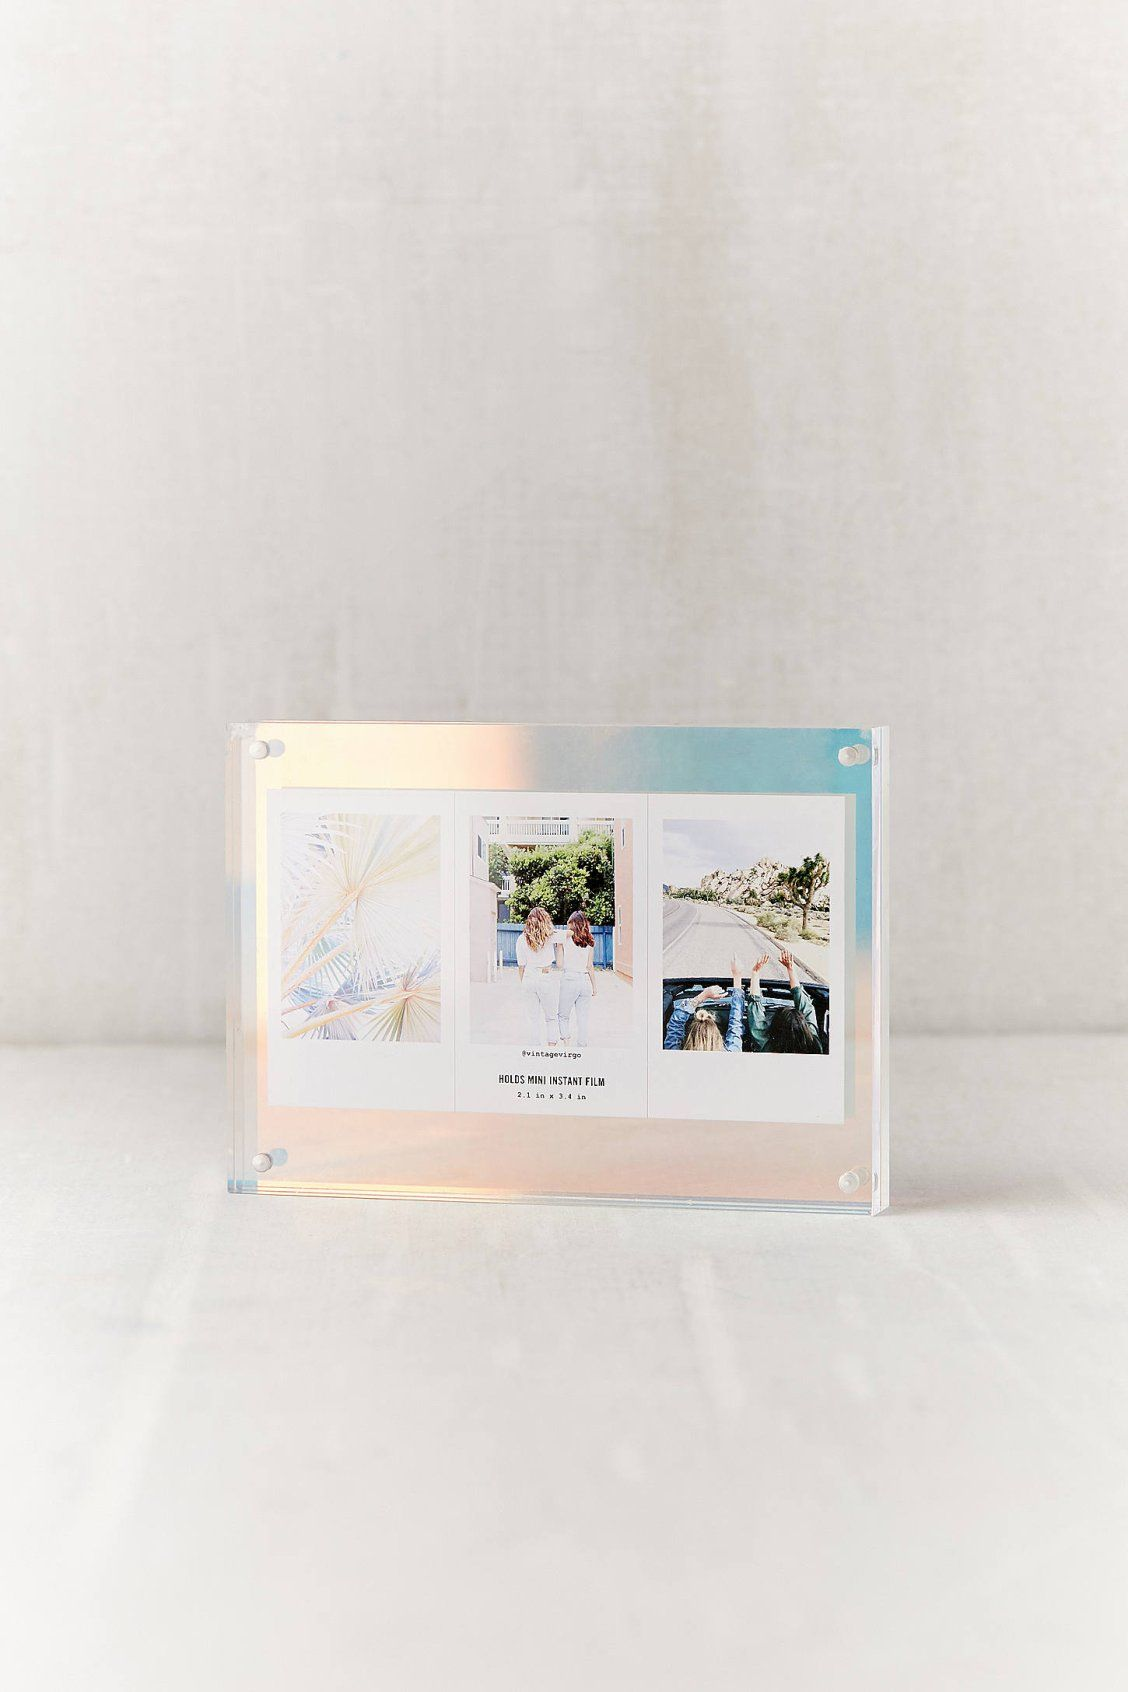 Iridescent Mod Block Frame Iridescent Decor Frame Glitter Picture Frames